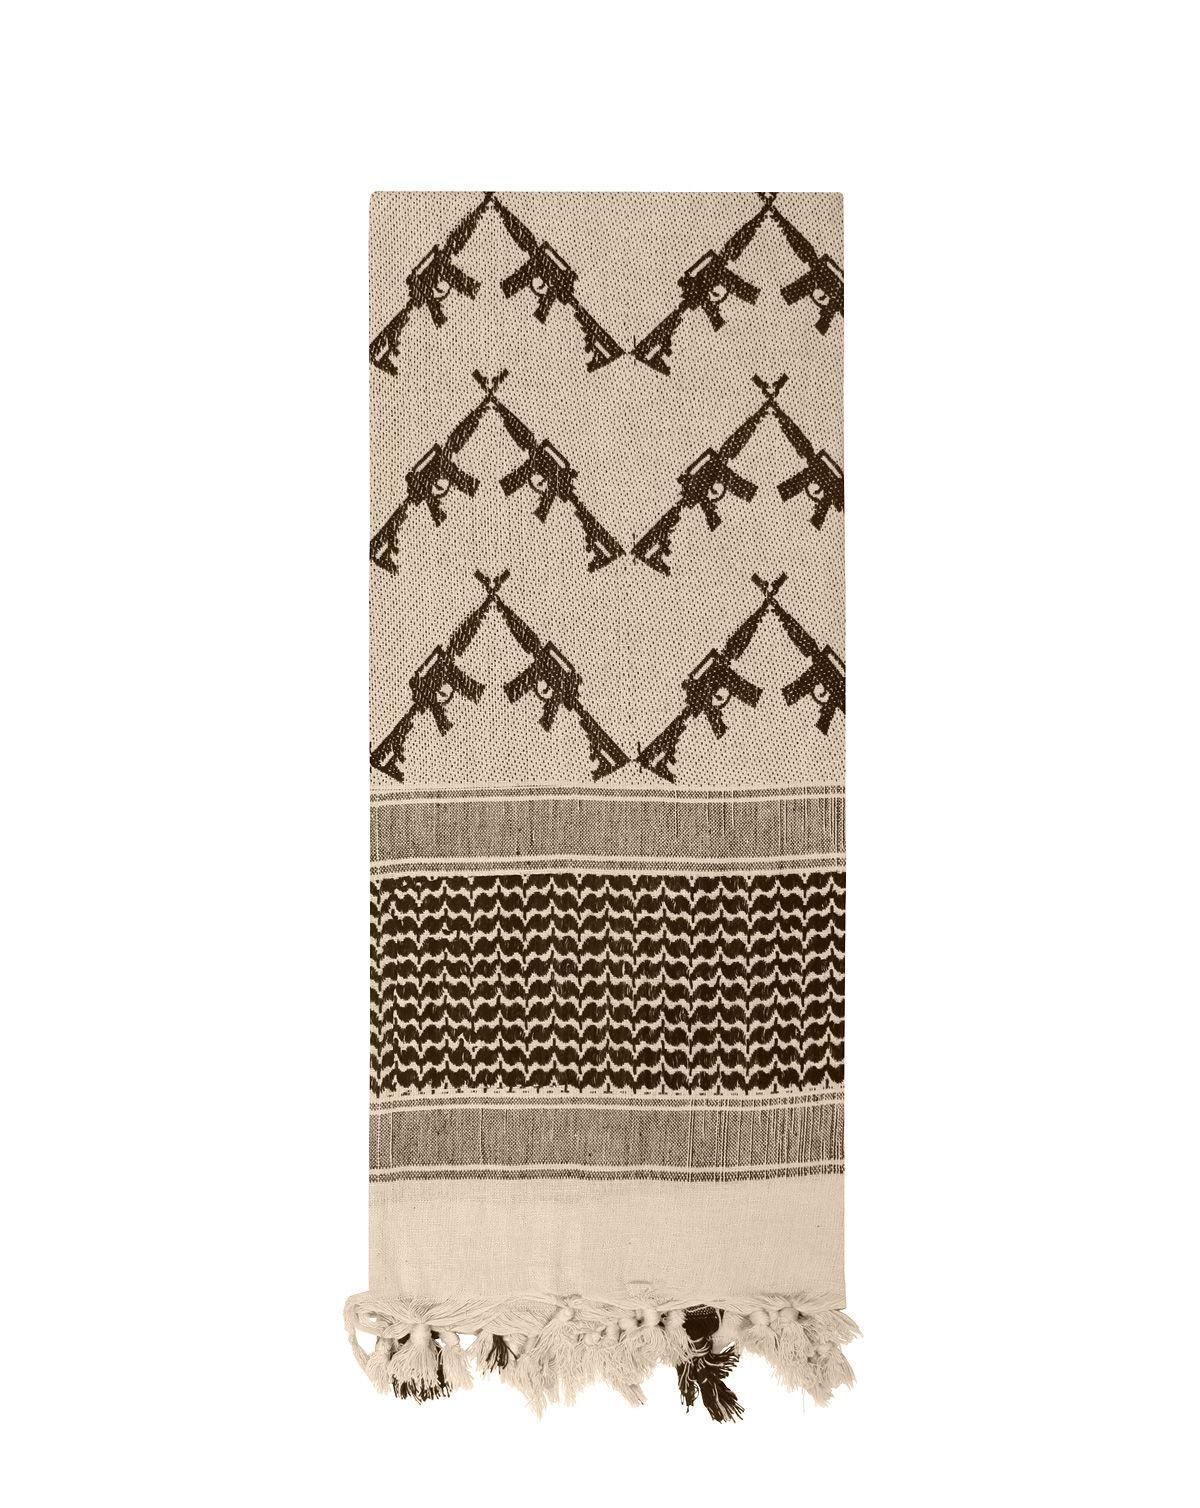 Image of   Rothco Taktisk Partisan Tørklæde - 'Crossed Rifle' (Khaki, One Size)